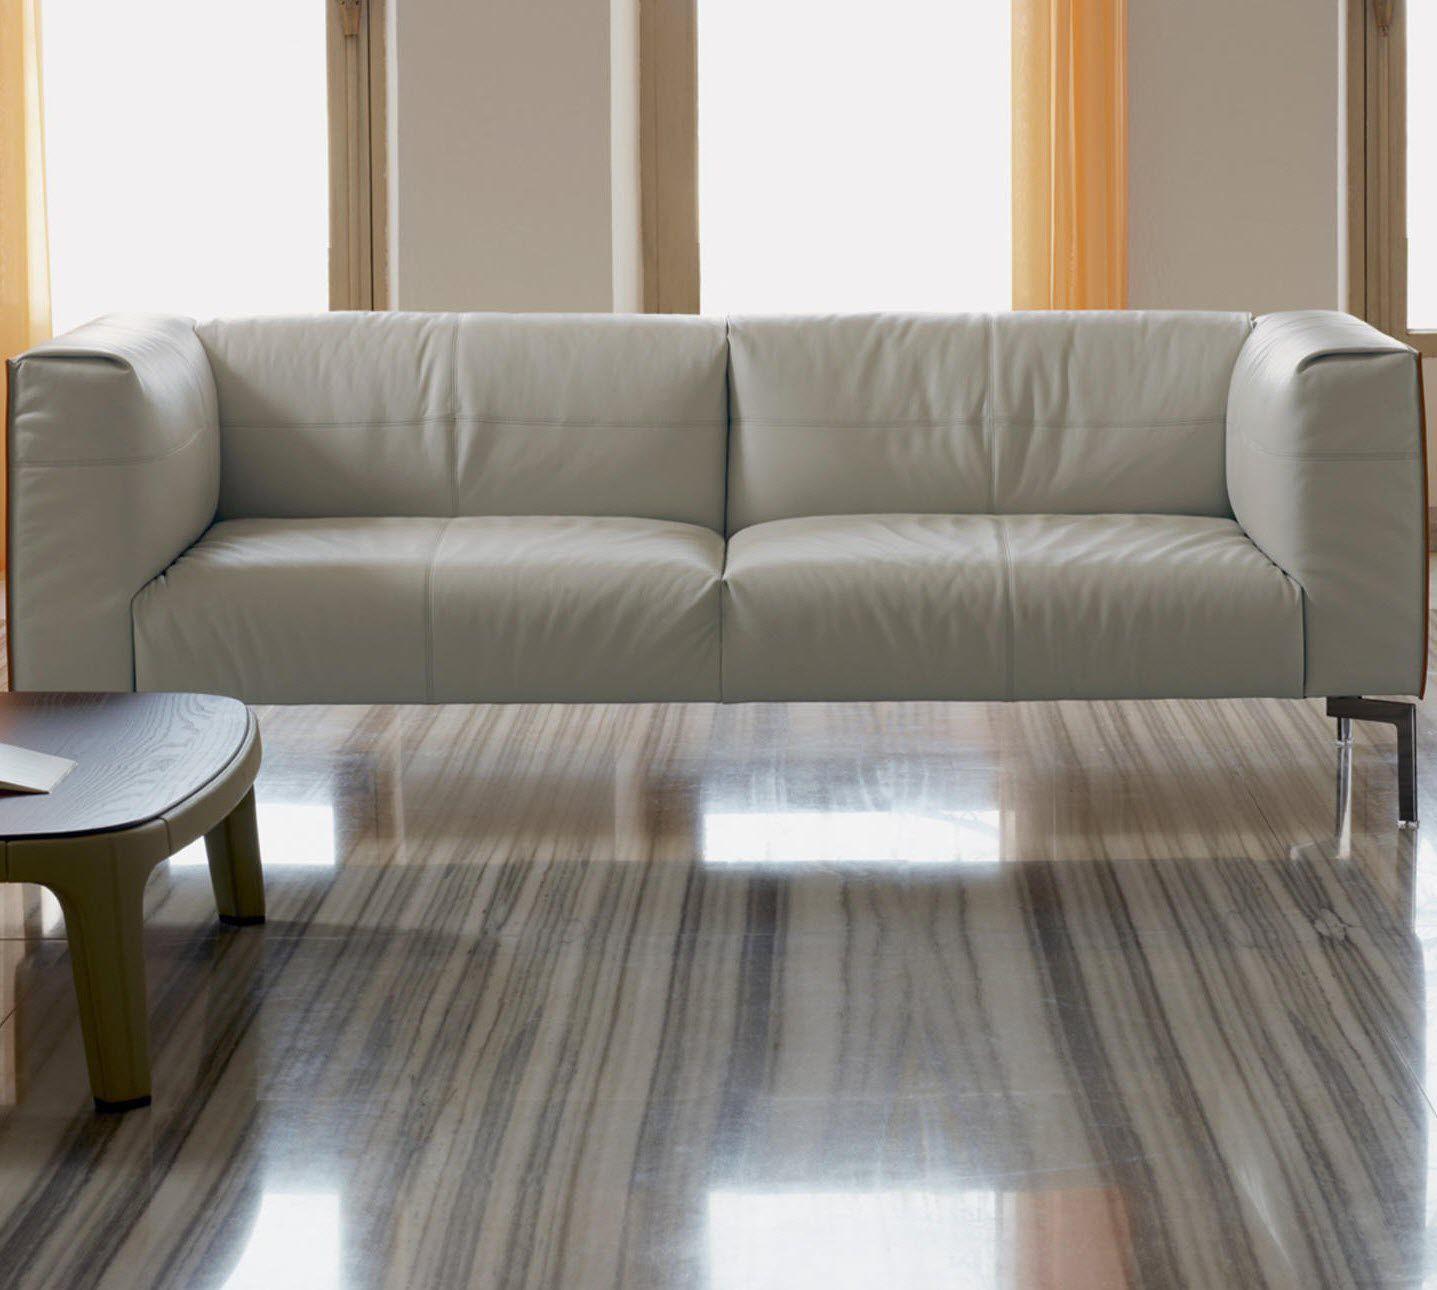 Poltrona Frau Bosforo.Contemporary Sofa Leather Steel By Sezgin Aksu